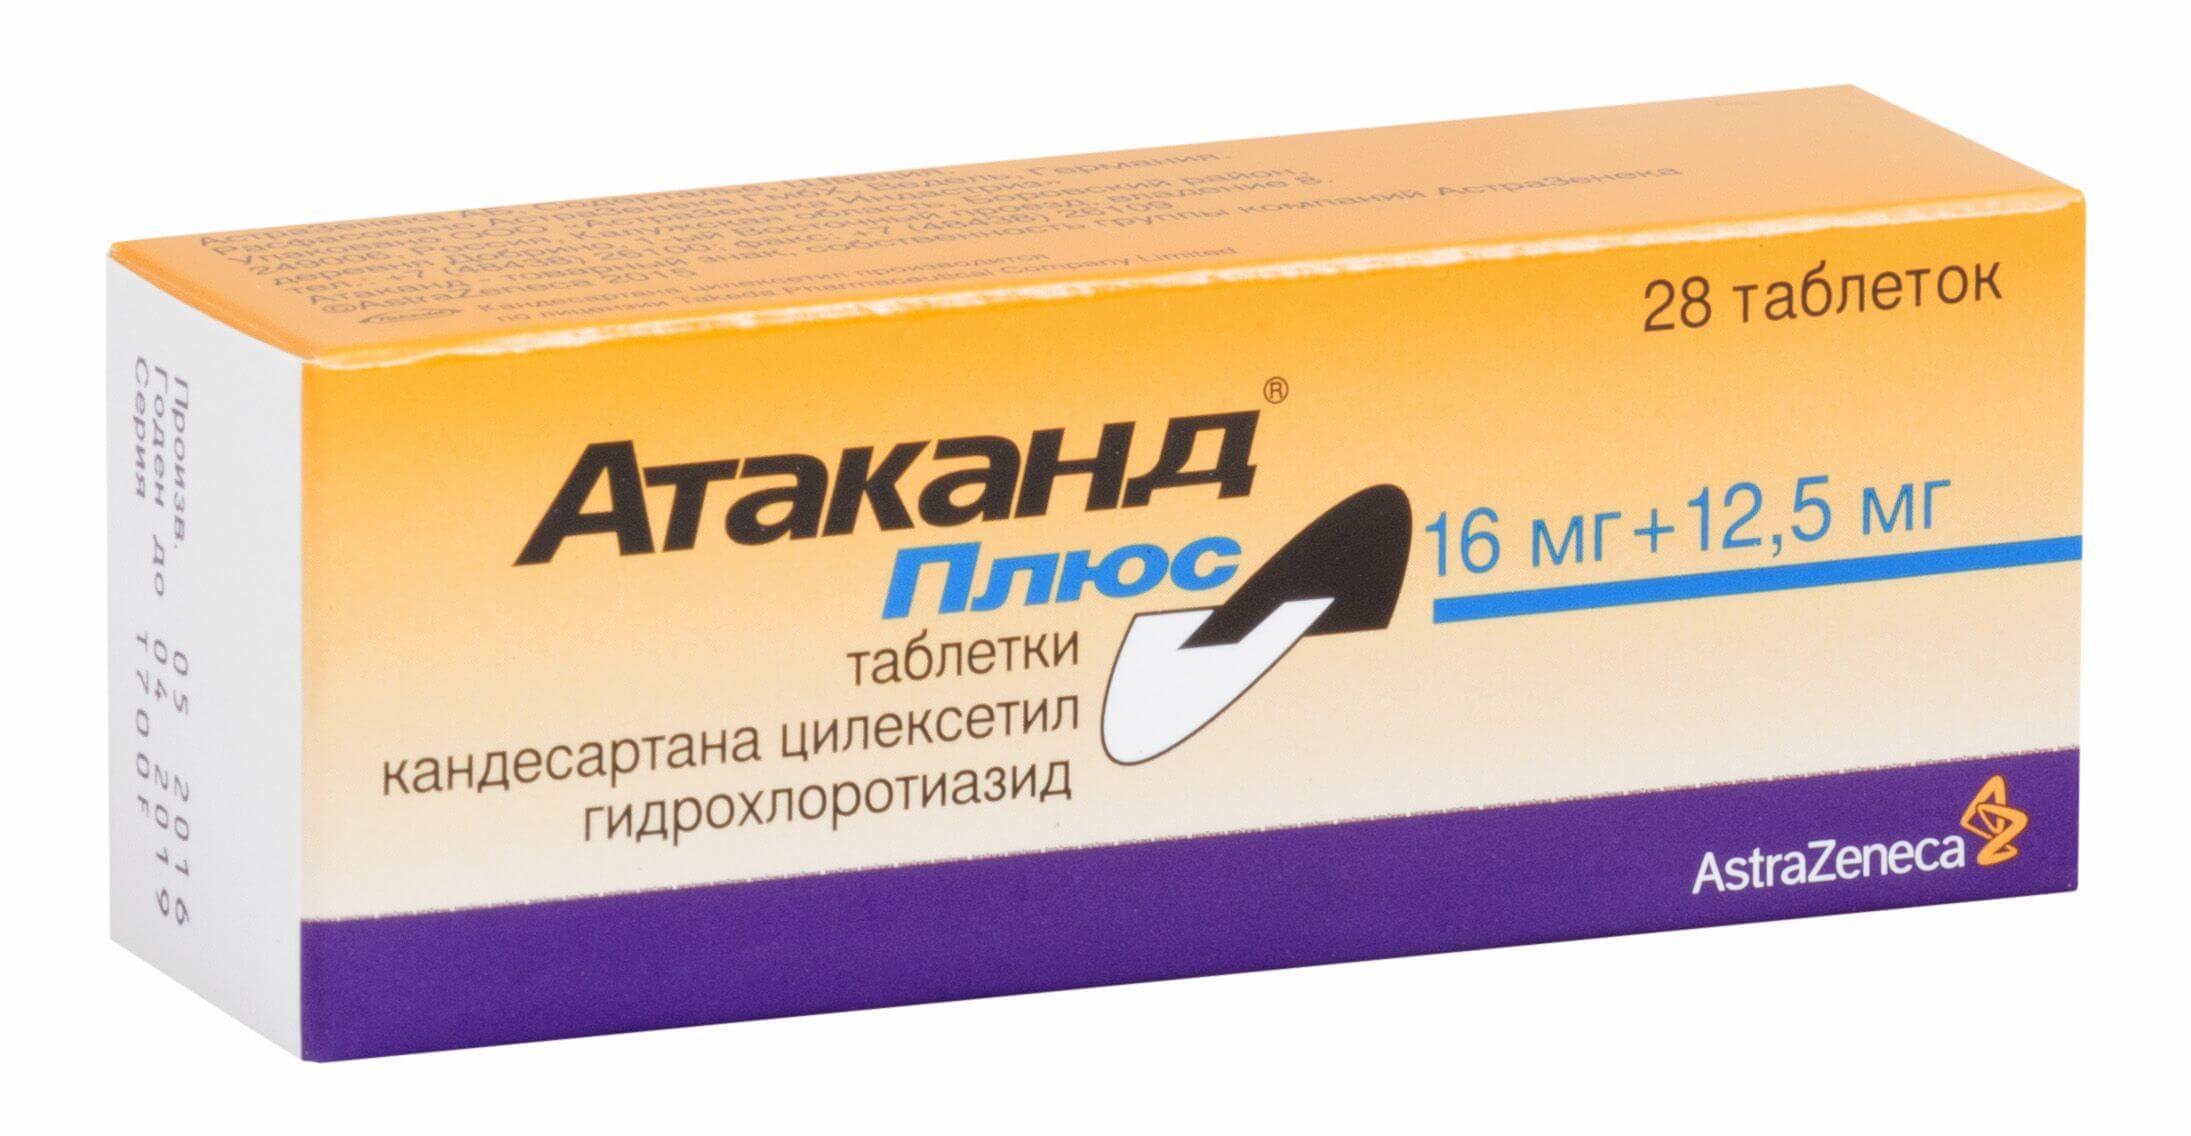 Атаканд плюс: инструкция по применению таблеток